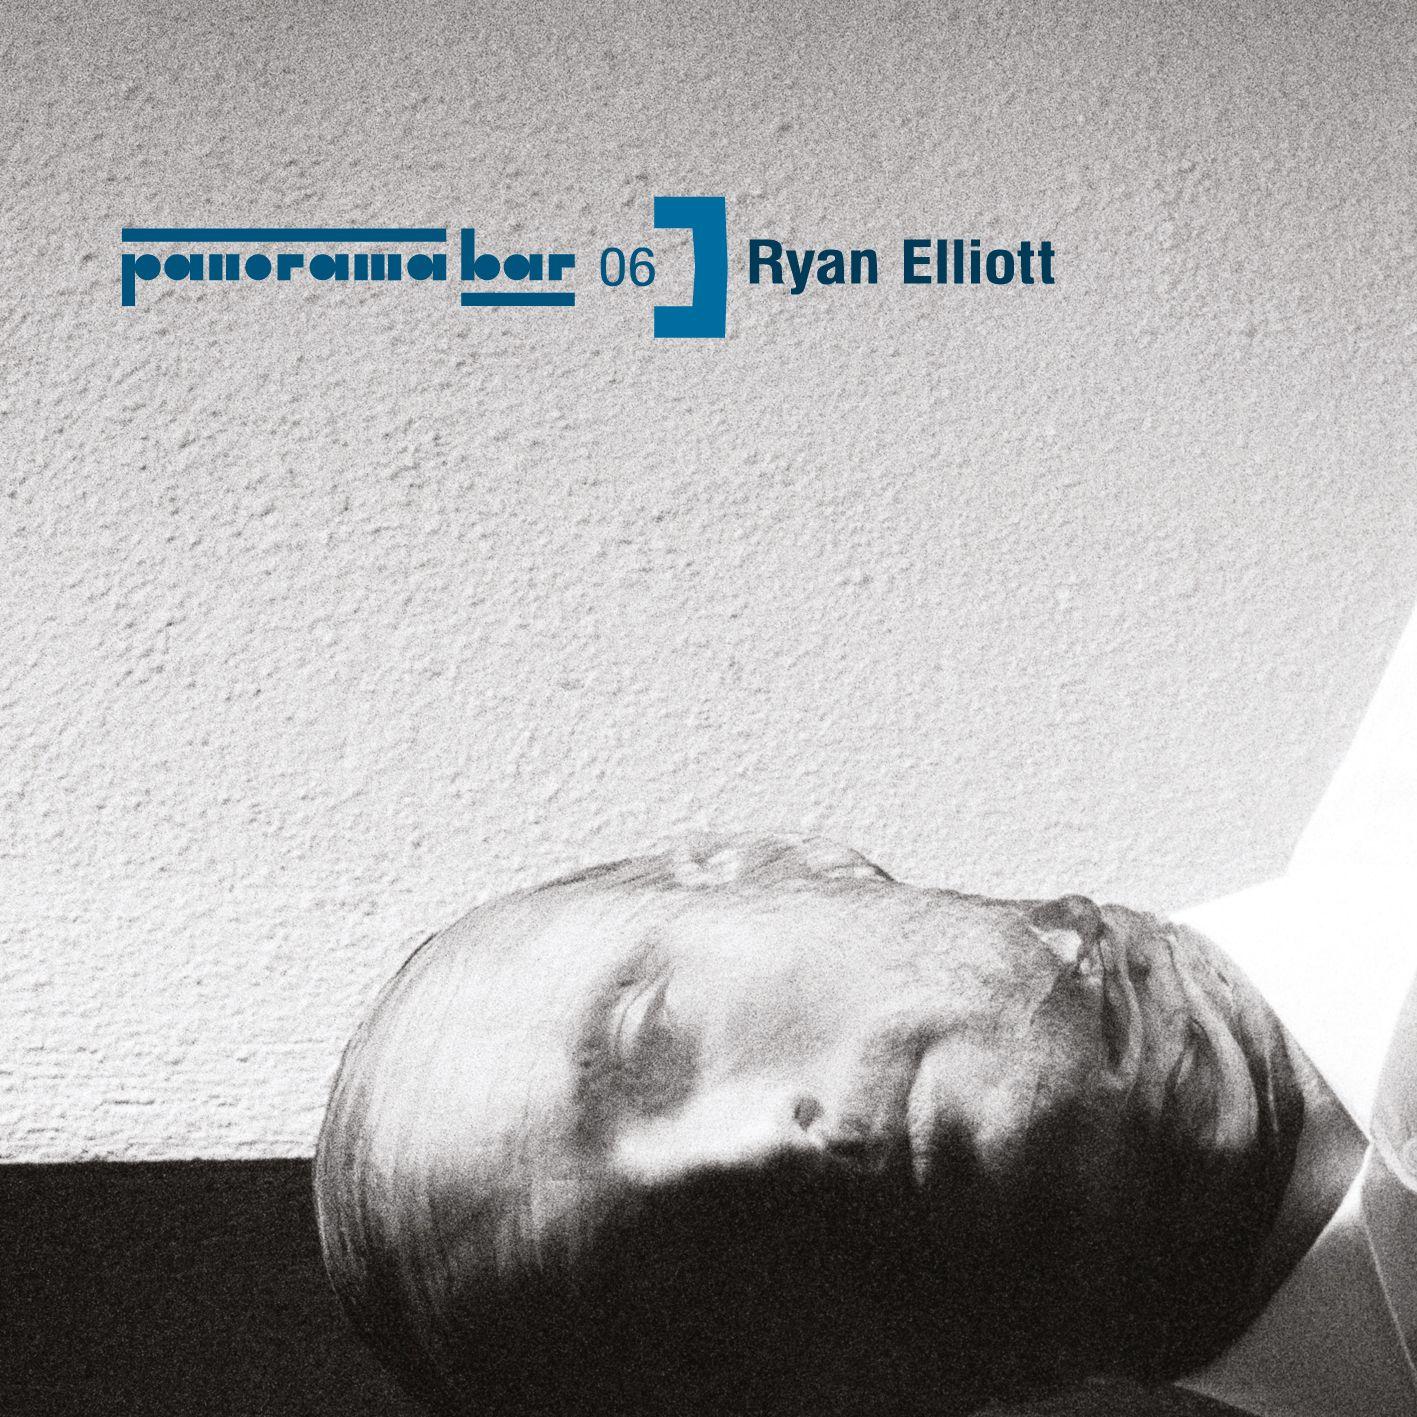 EINMALIGE VERWENDUNG Abgehört/ Ryan Elliott: Panorama Bar 06/ COVER